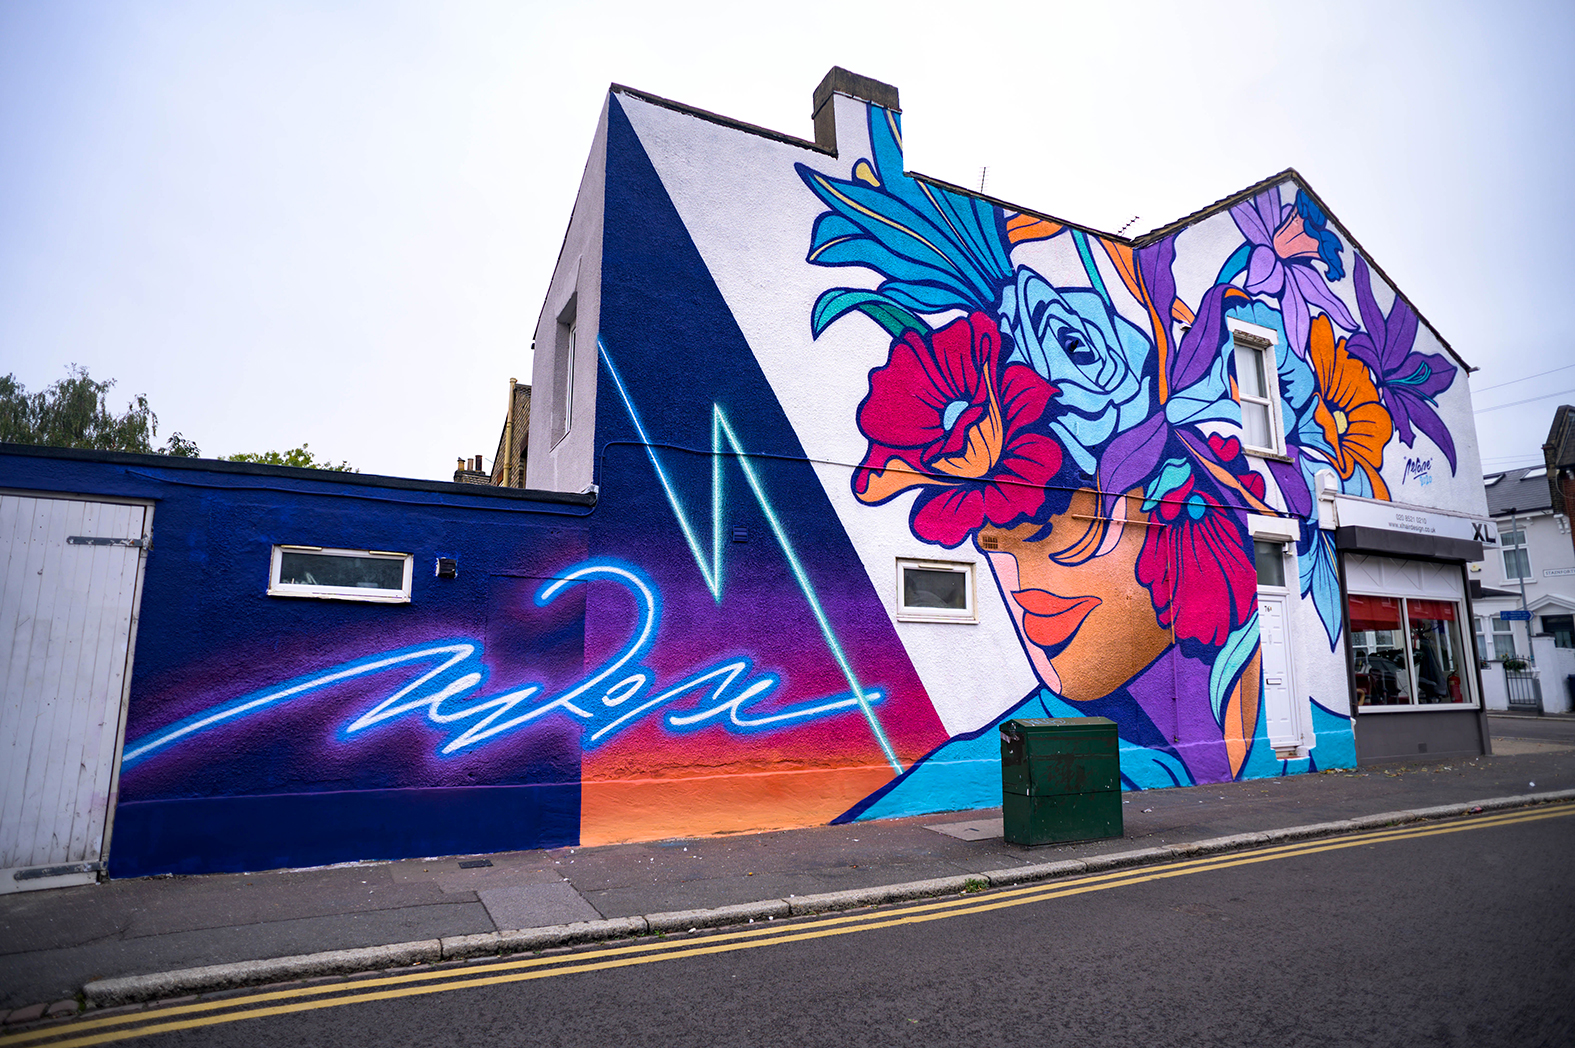 NERONE-mural-london-street-art-13